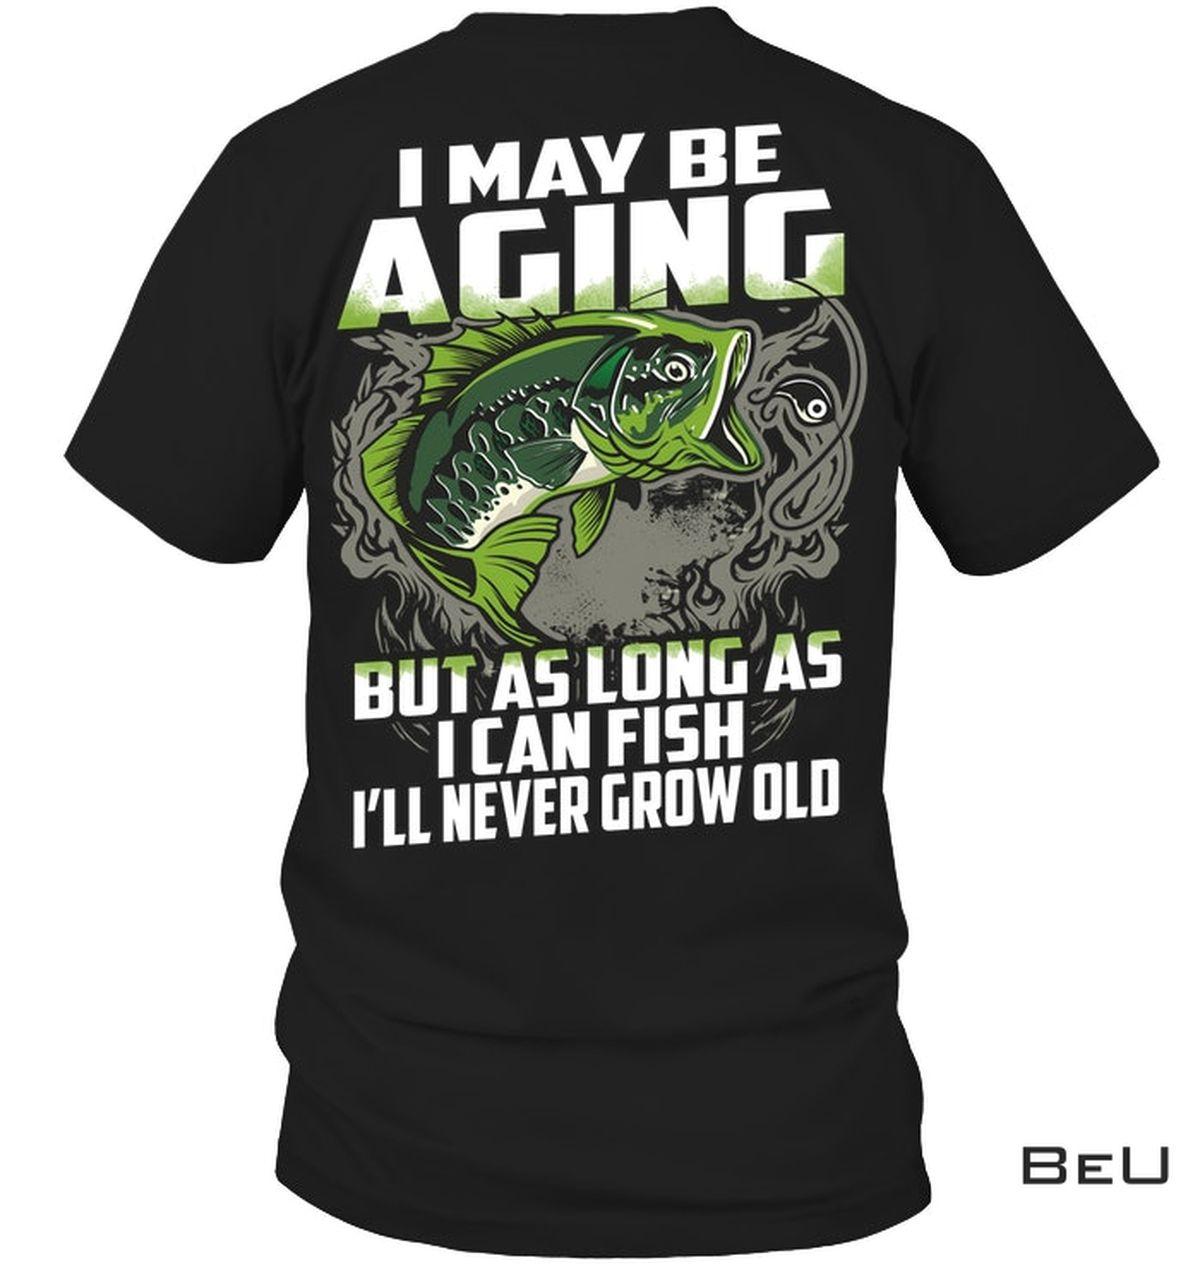 I May Be Aging But As Long As I Can Fish I'll Never Grow Old Shirt, hoodie